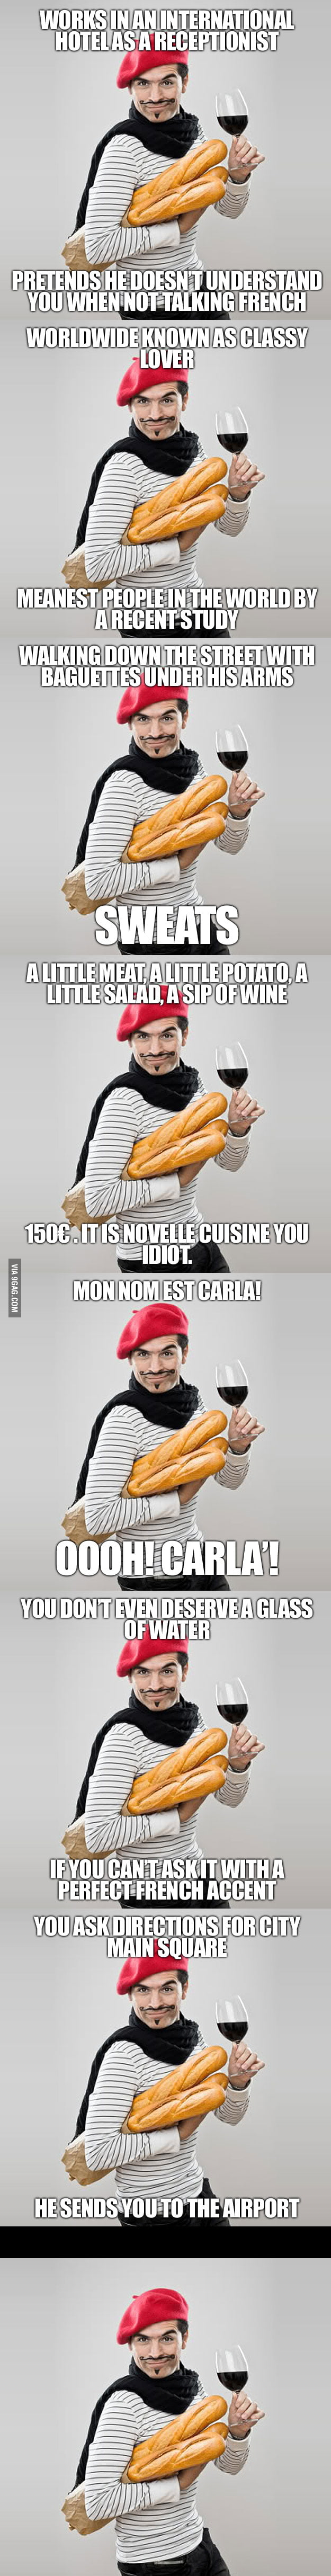 French Scumbag